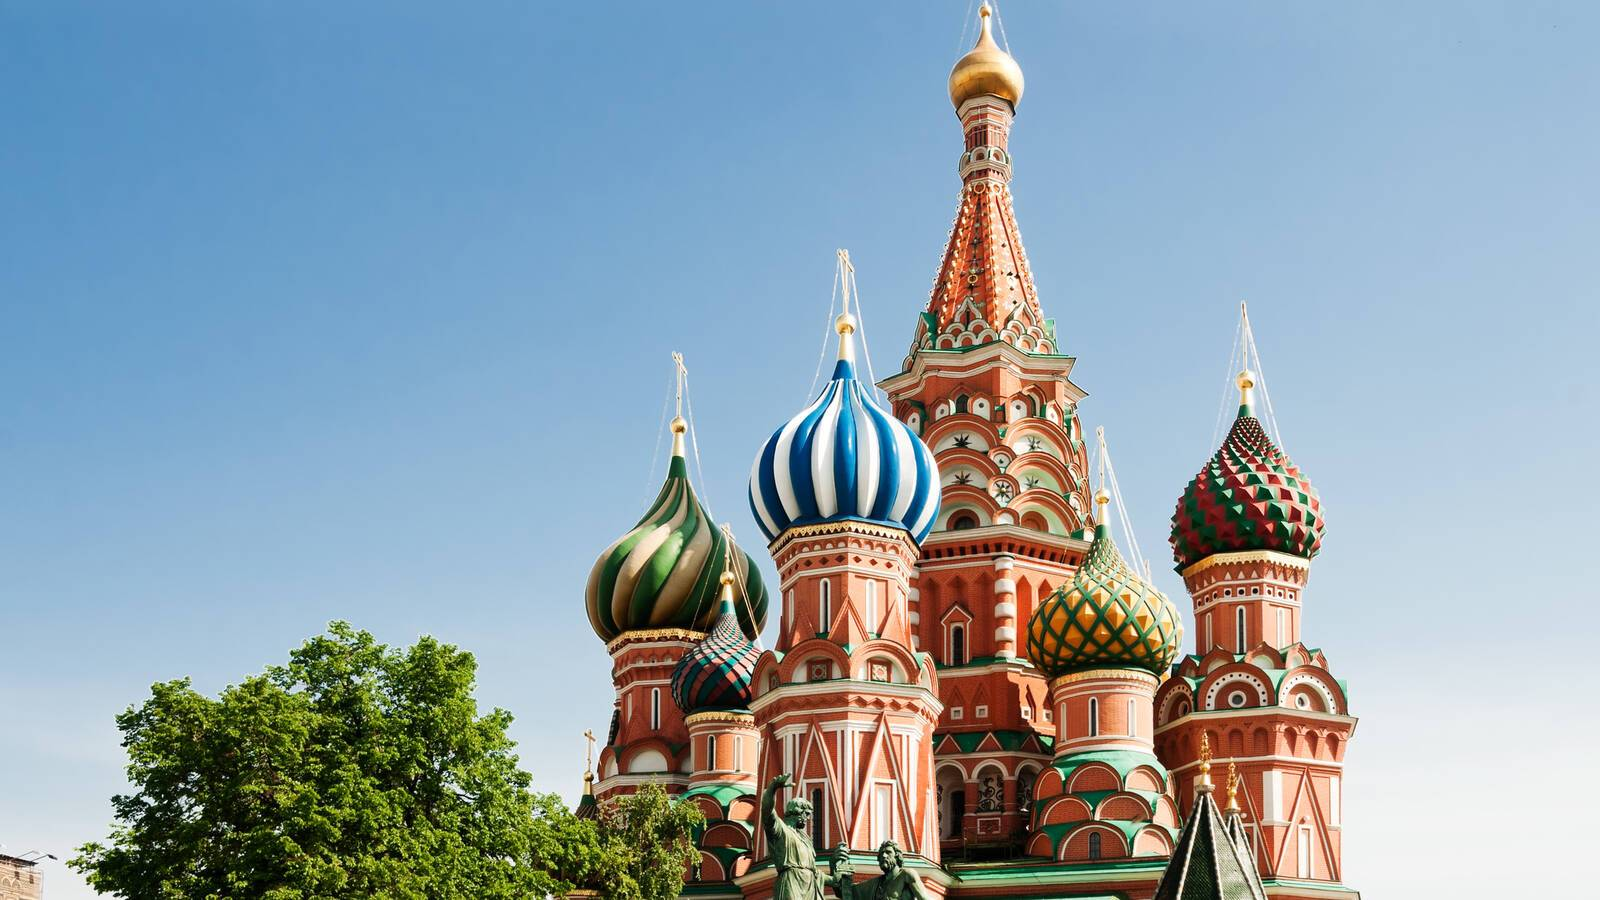 Moscou Cathedrale Saint Basil Fotolia ValeriePotapova